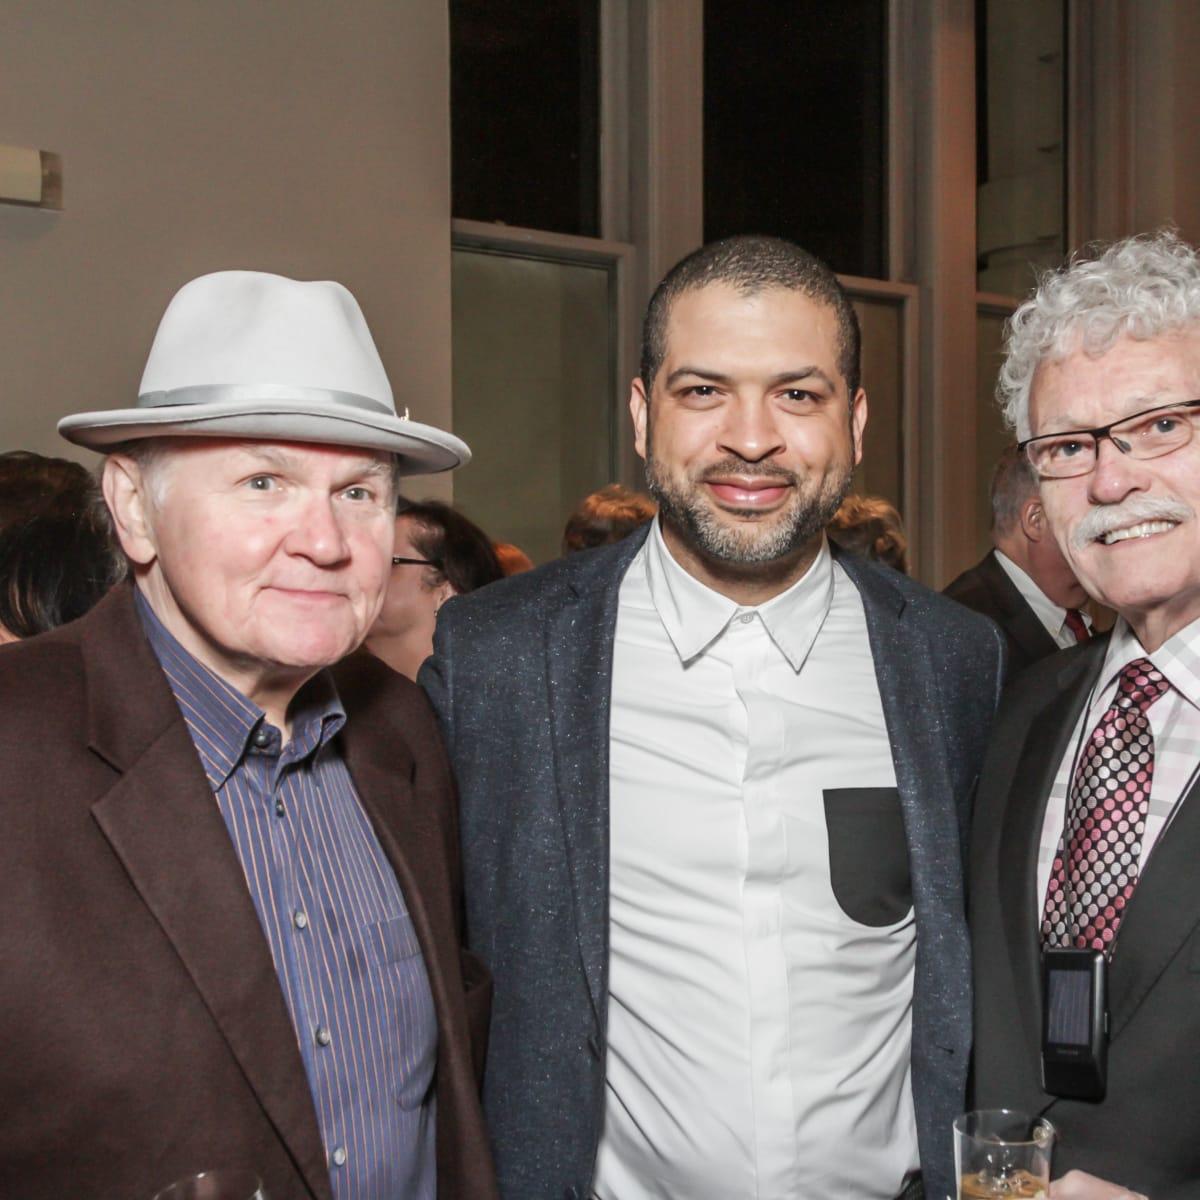 Bruce Stram, Jason Moran, Bob Morgan at Club da Camera